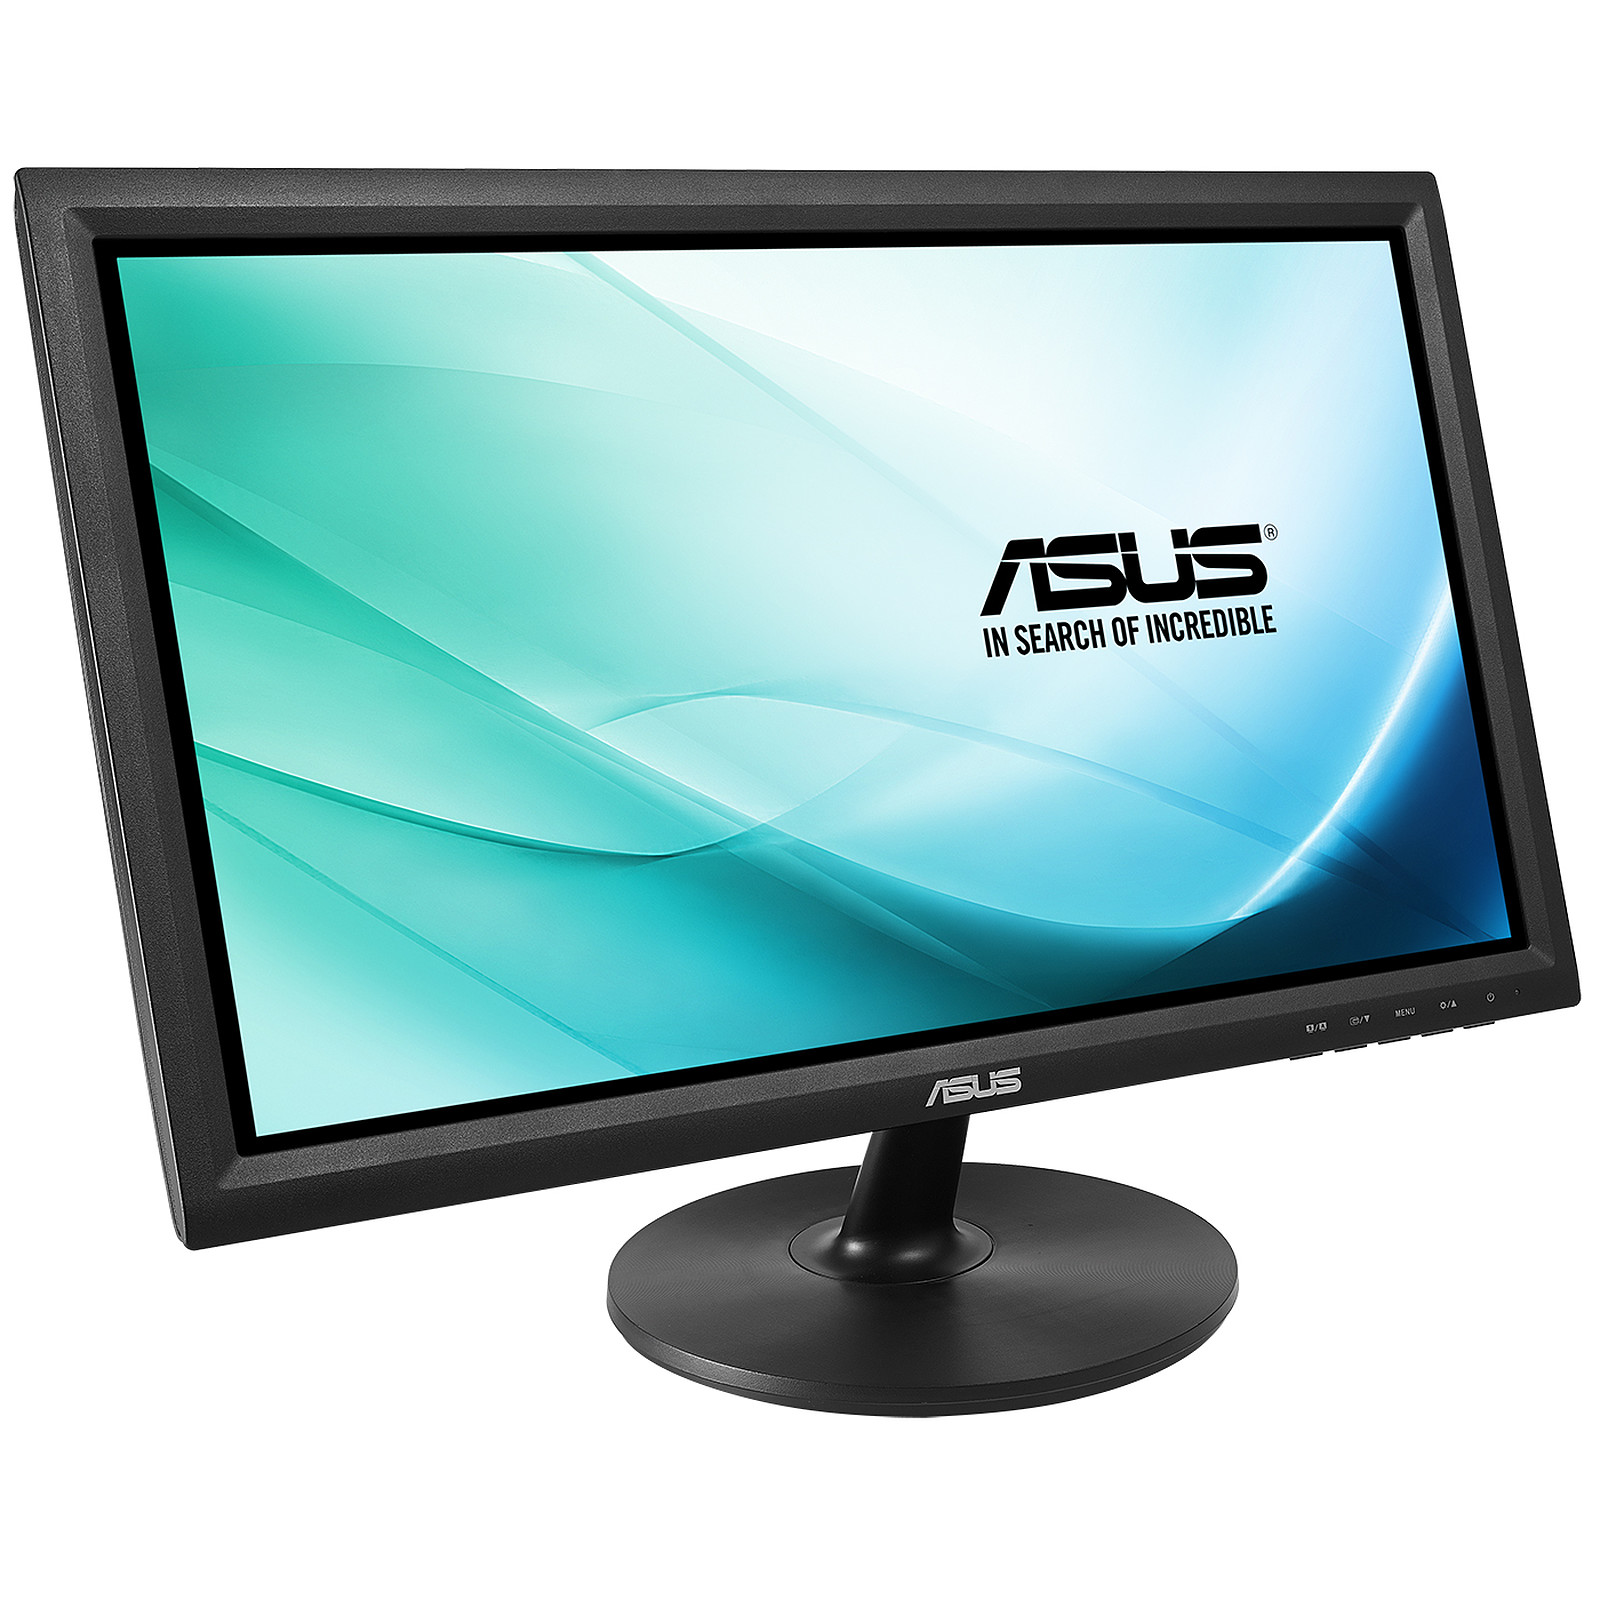 "ASUS 19.5"" LED Tactile - VT207N"